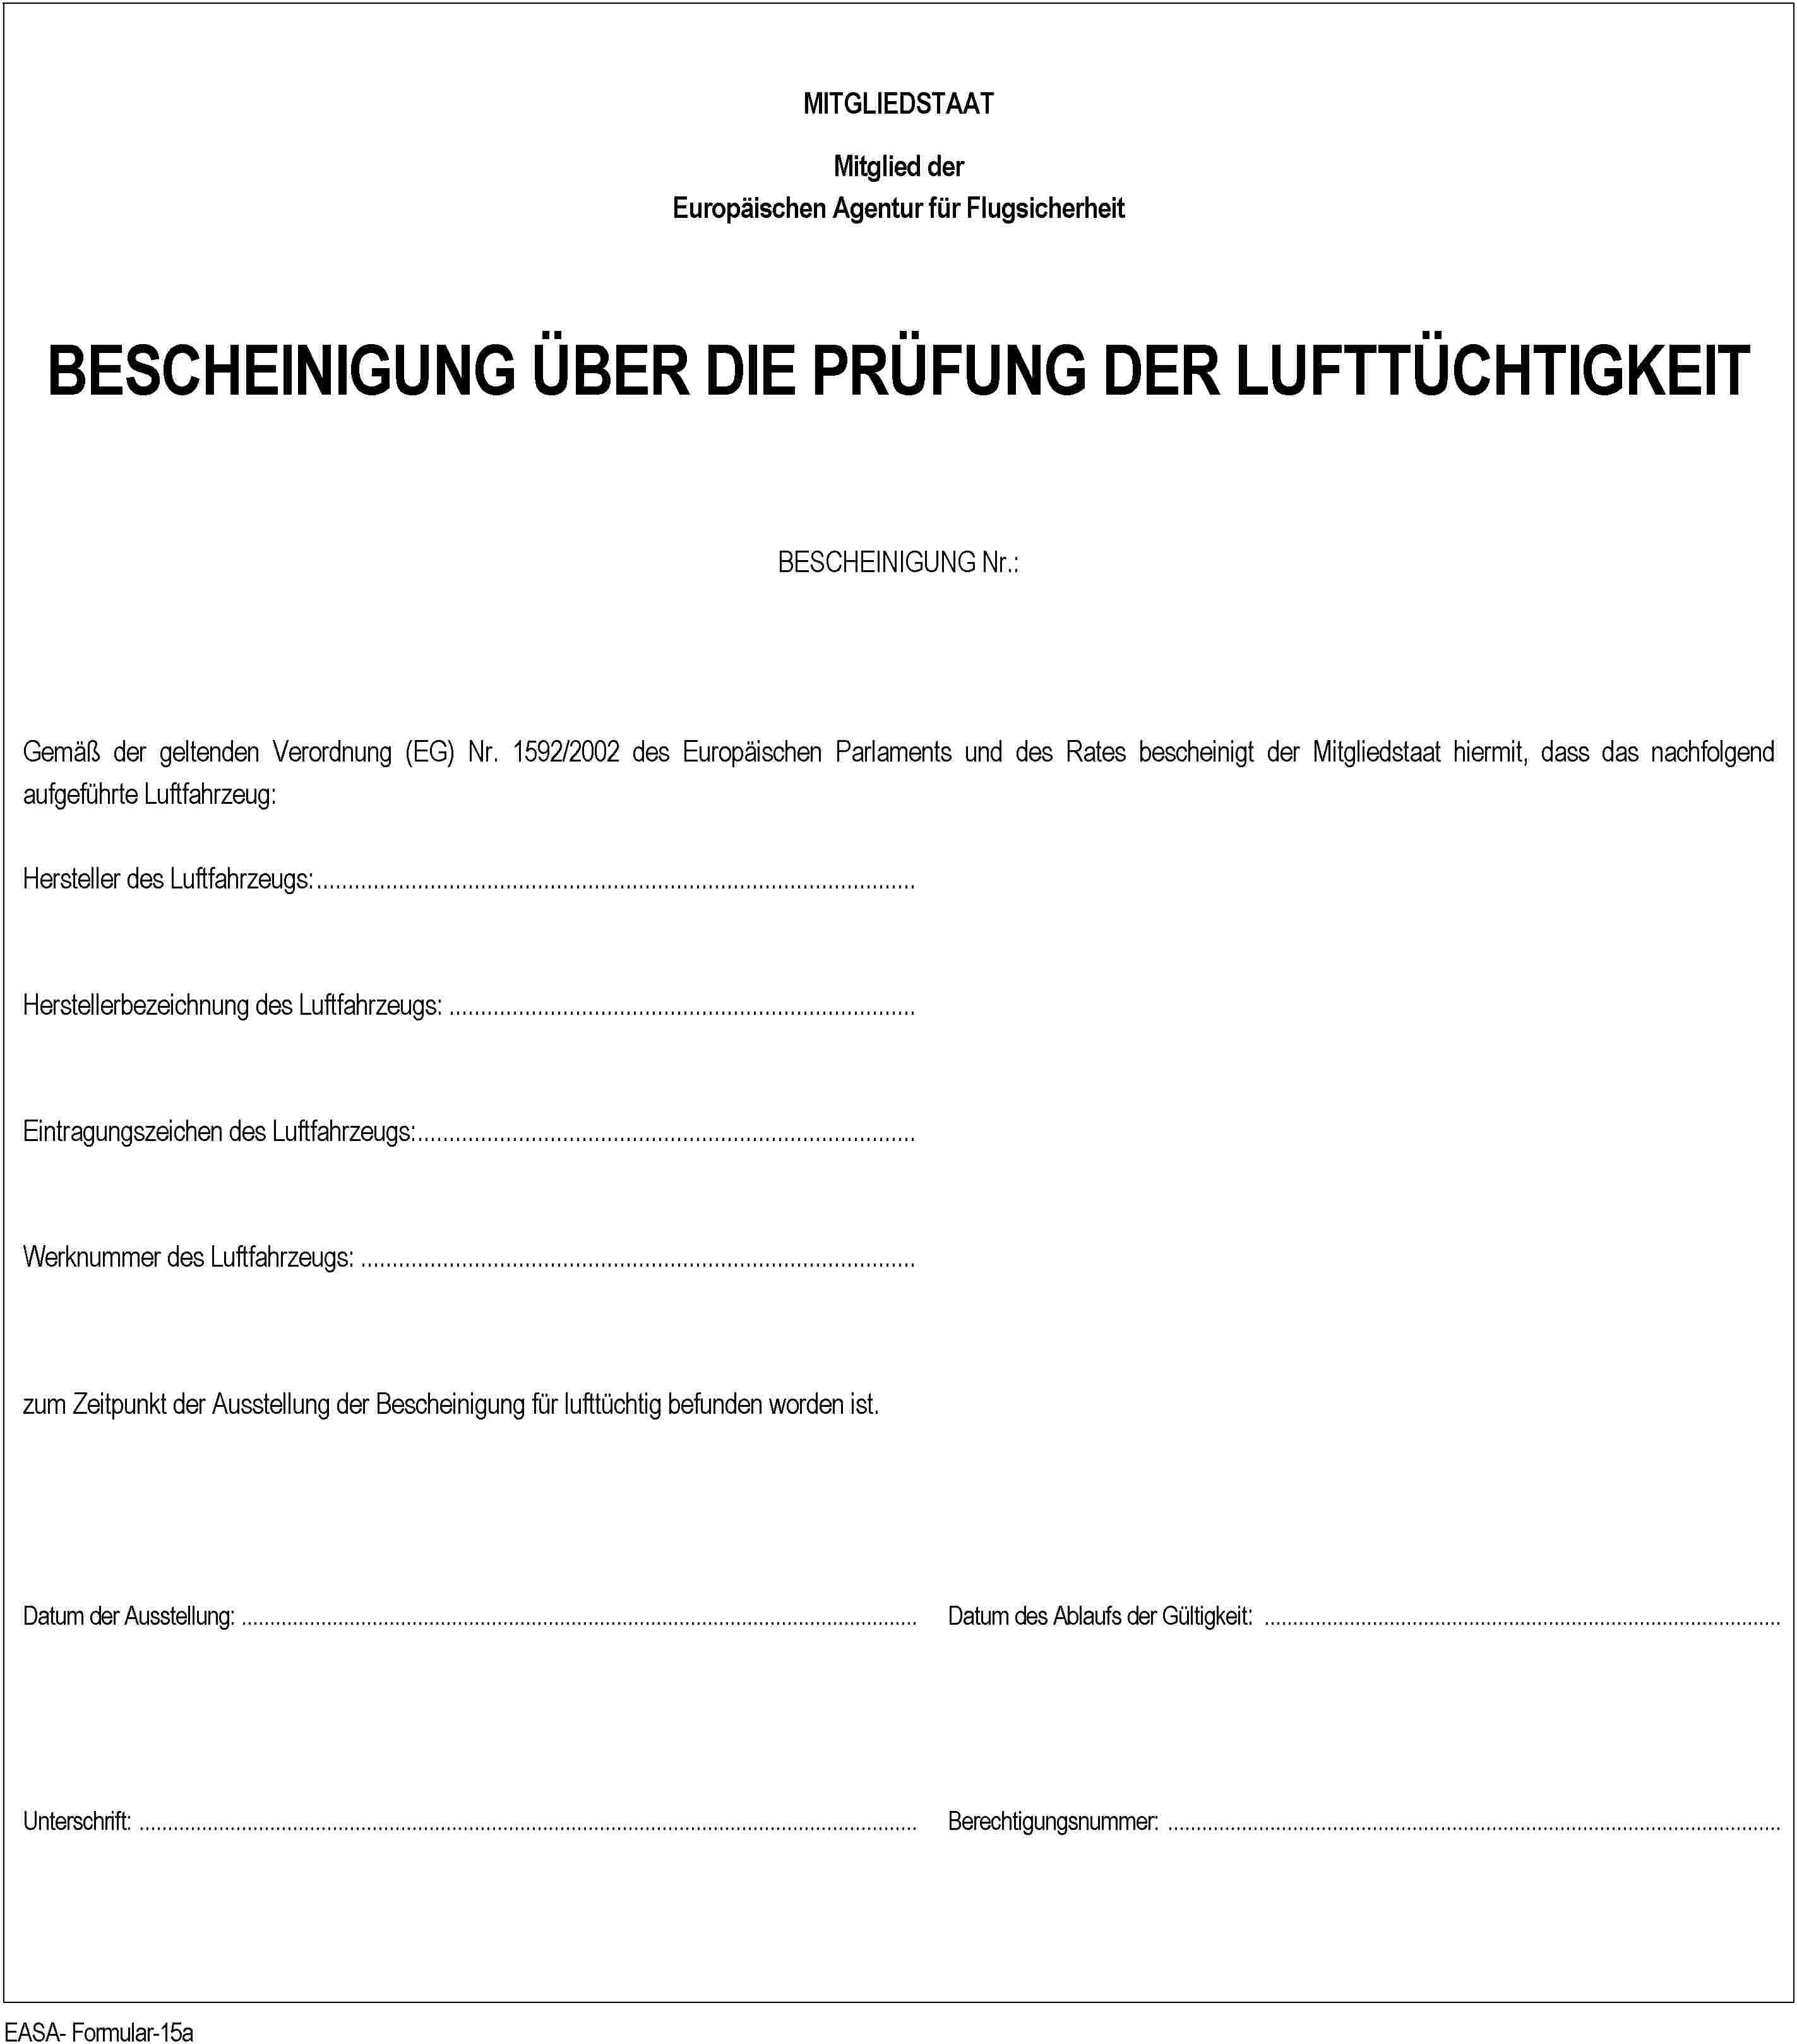 EUR-Lex - 02003R2042-20060510 - EN - EUR-Lex